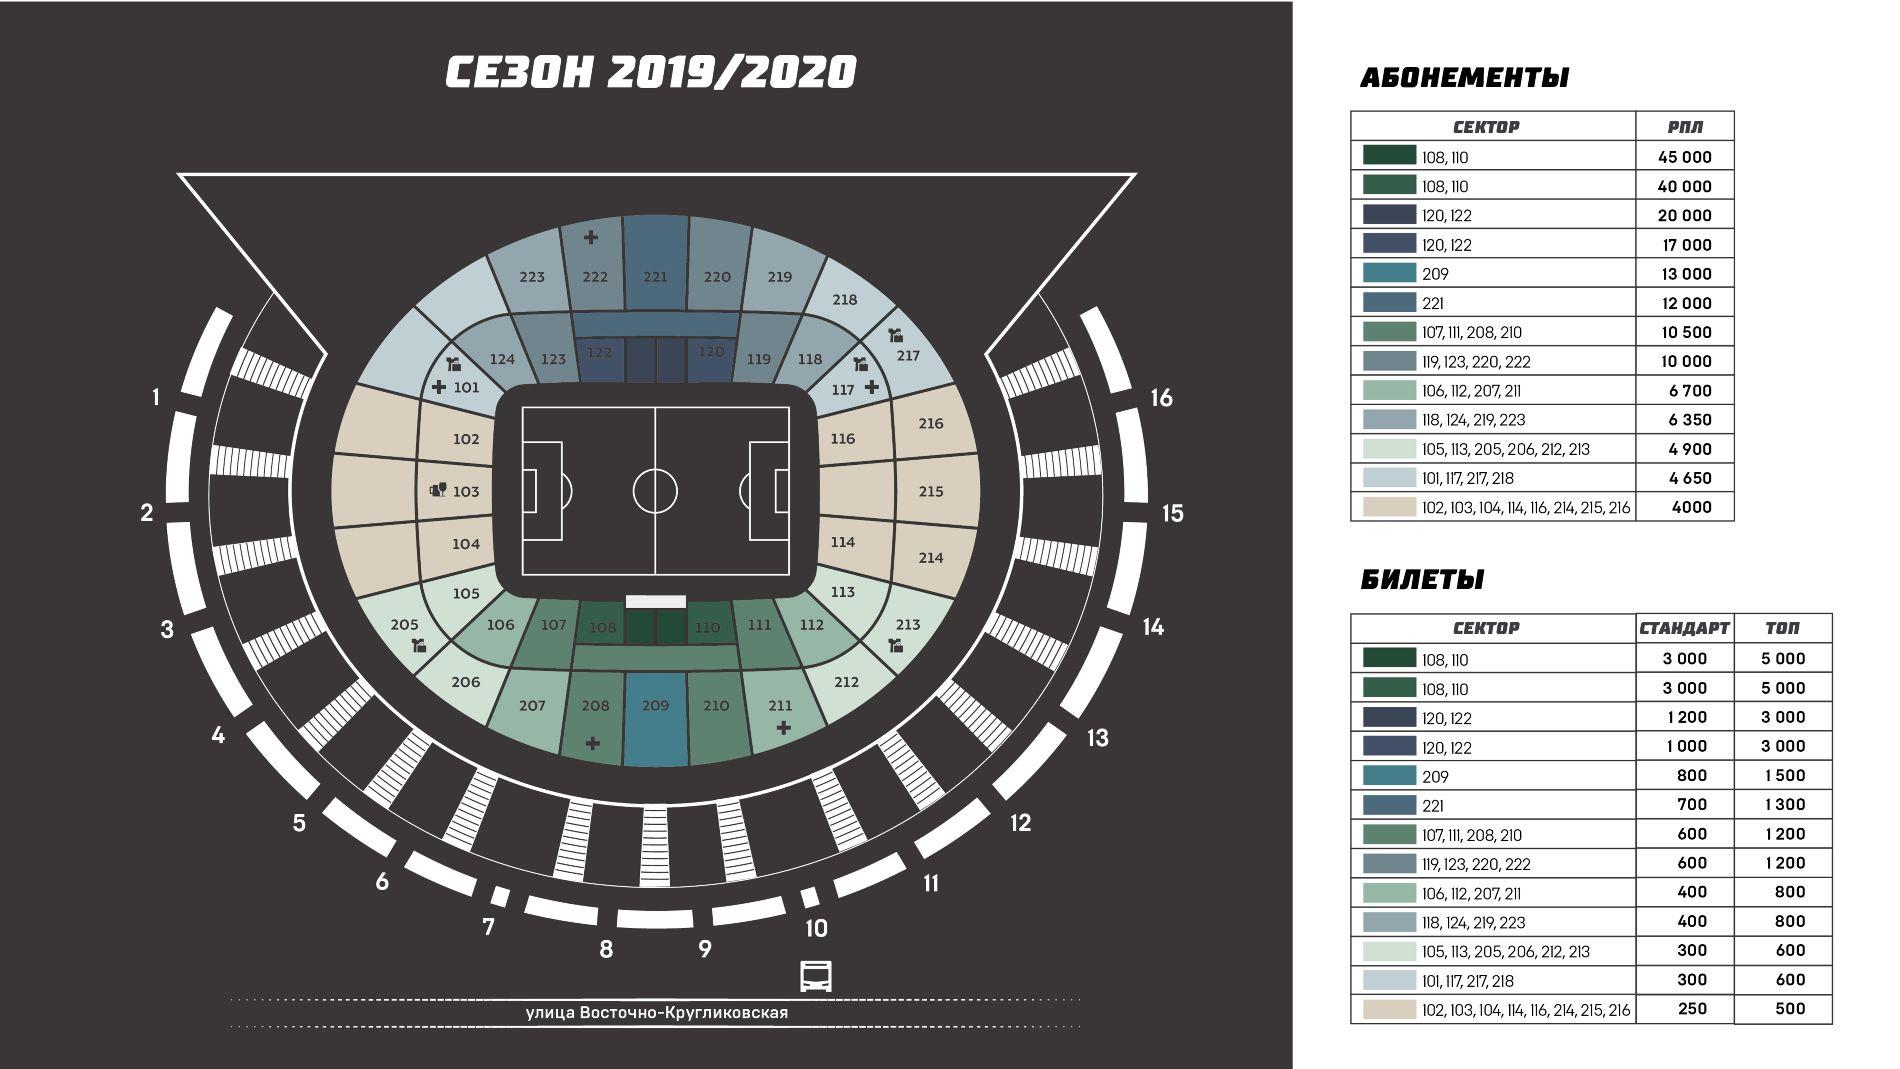 Схема стадиона ФК «Краснодар» с ценами на сезон-2019/20 ©Графика пресс-службы ФК «Краснодар»